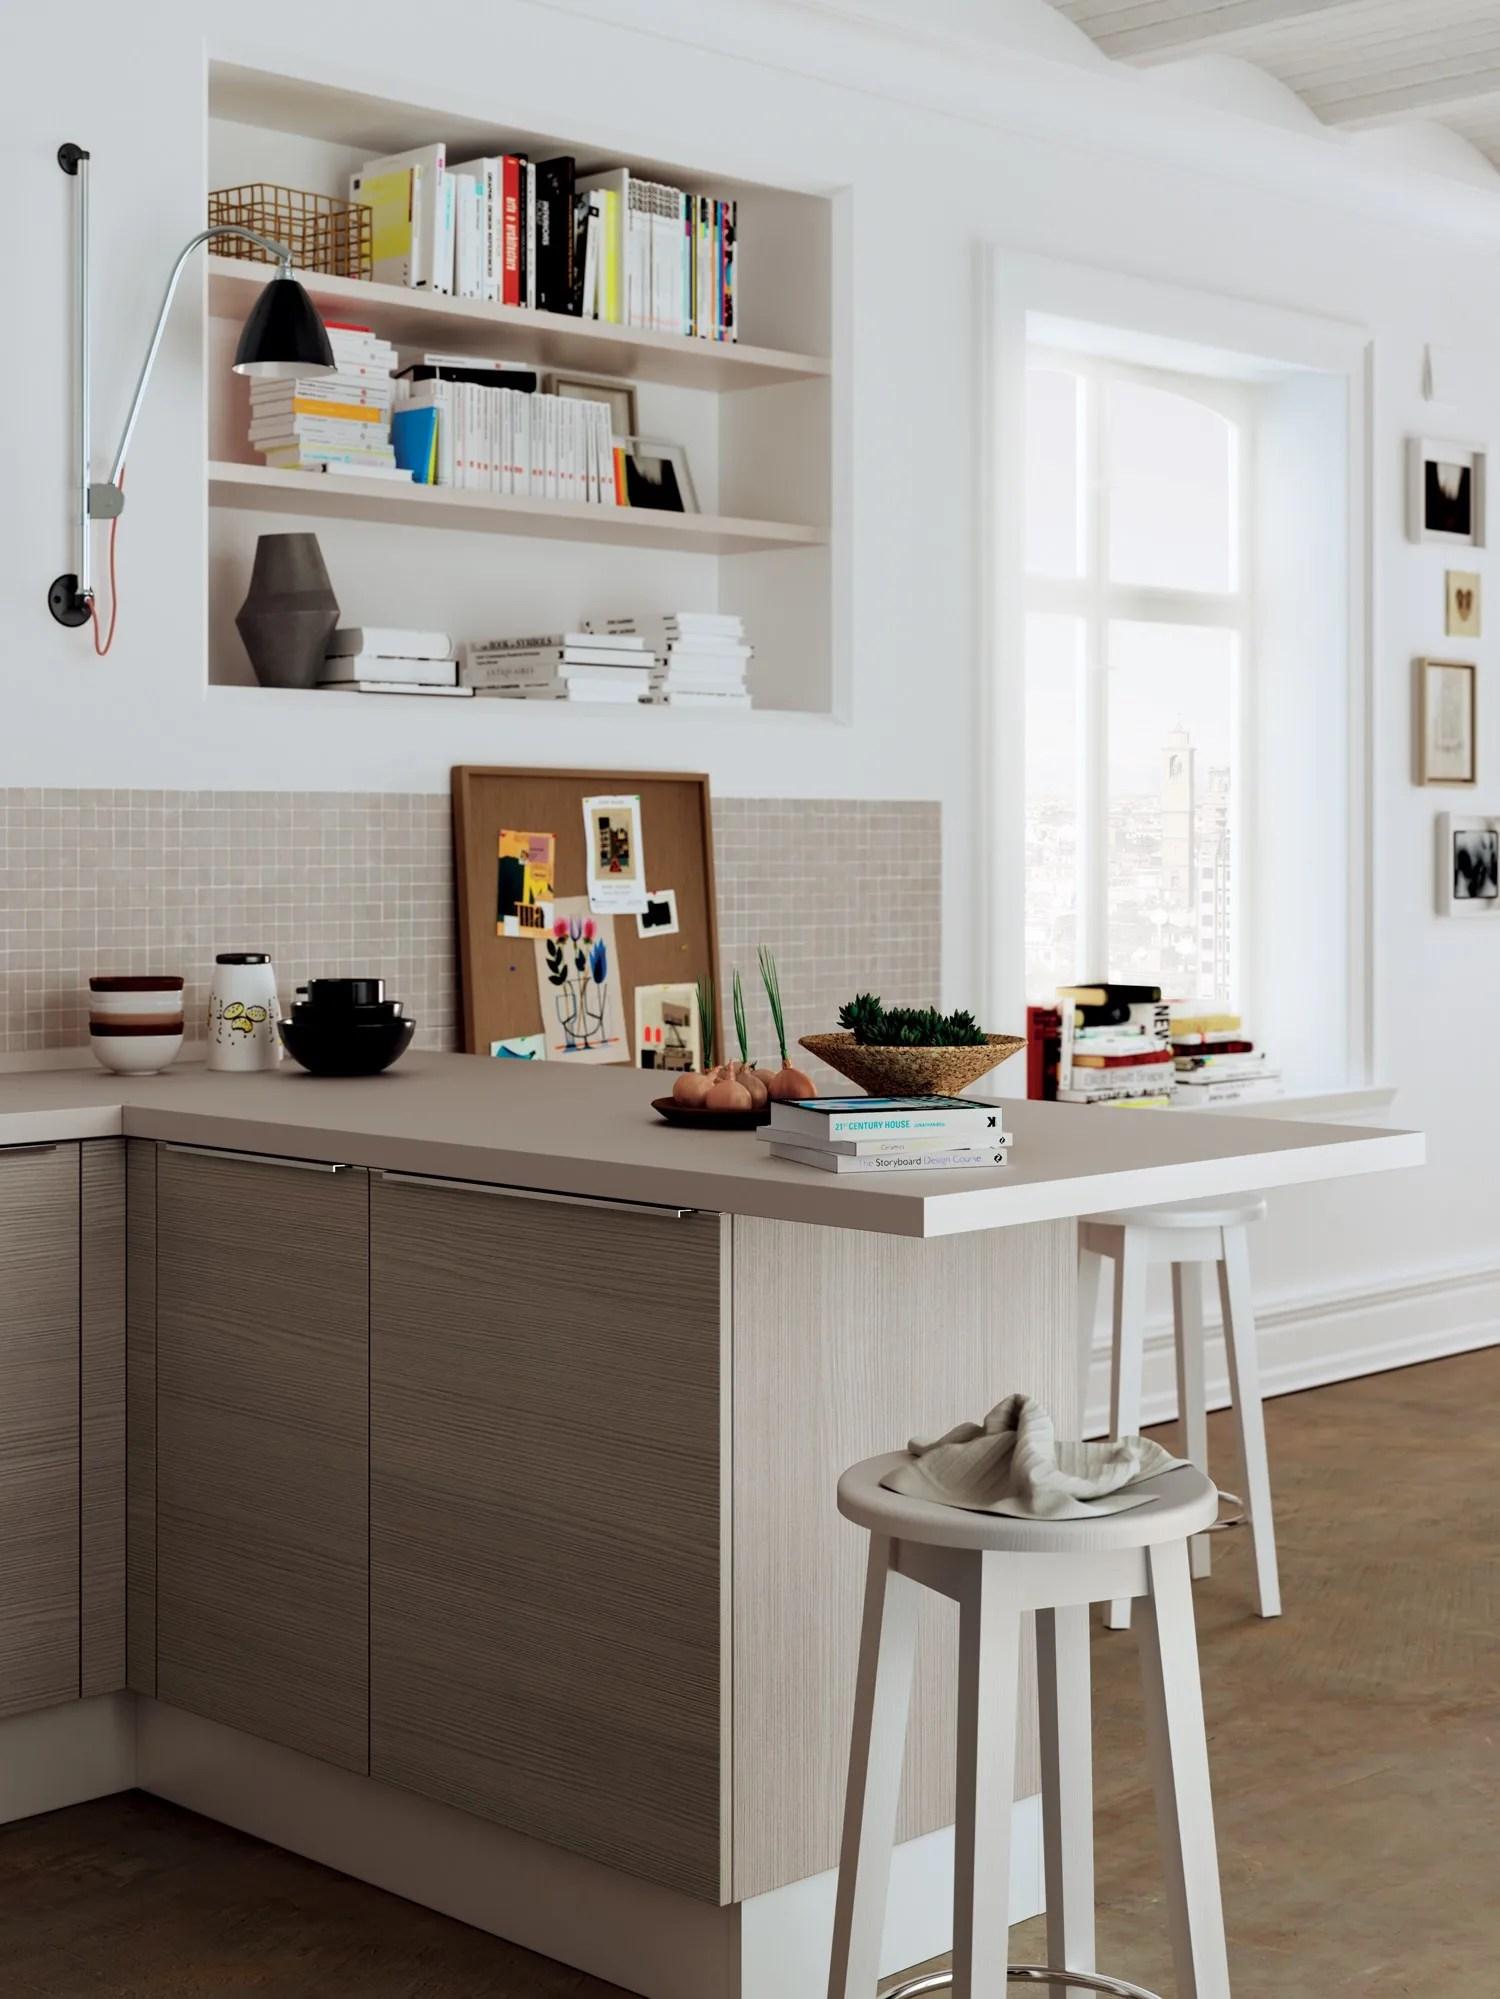 Cucina componibile URBANURBAN MINIMAL Linea Scavolini